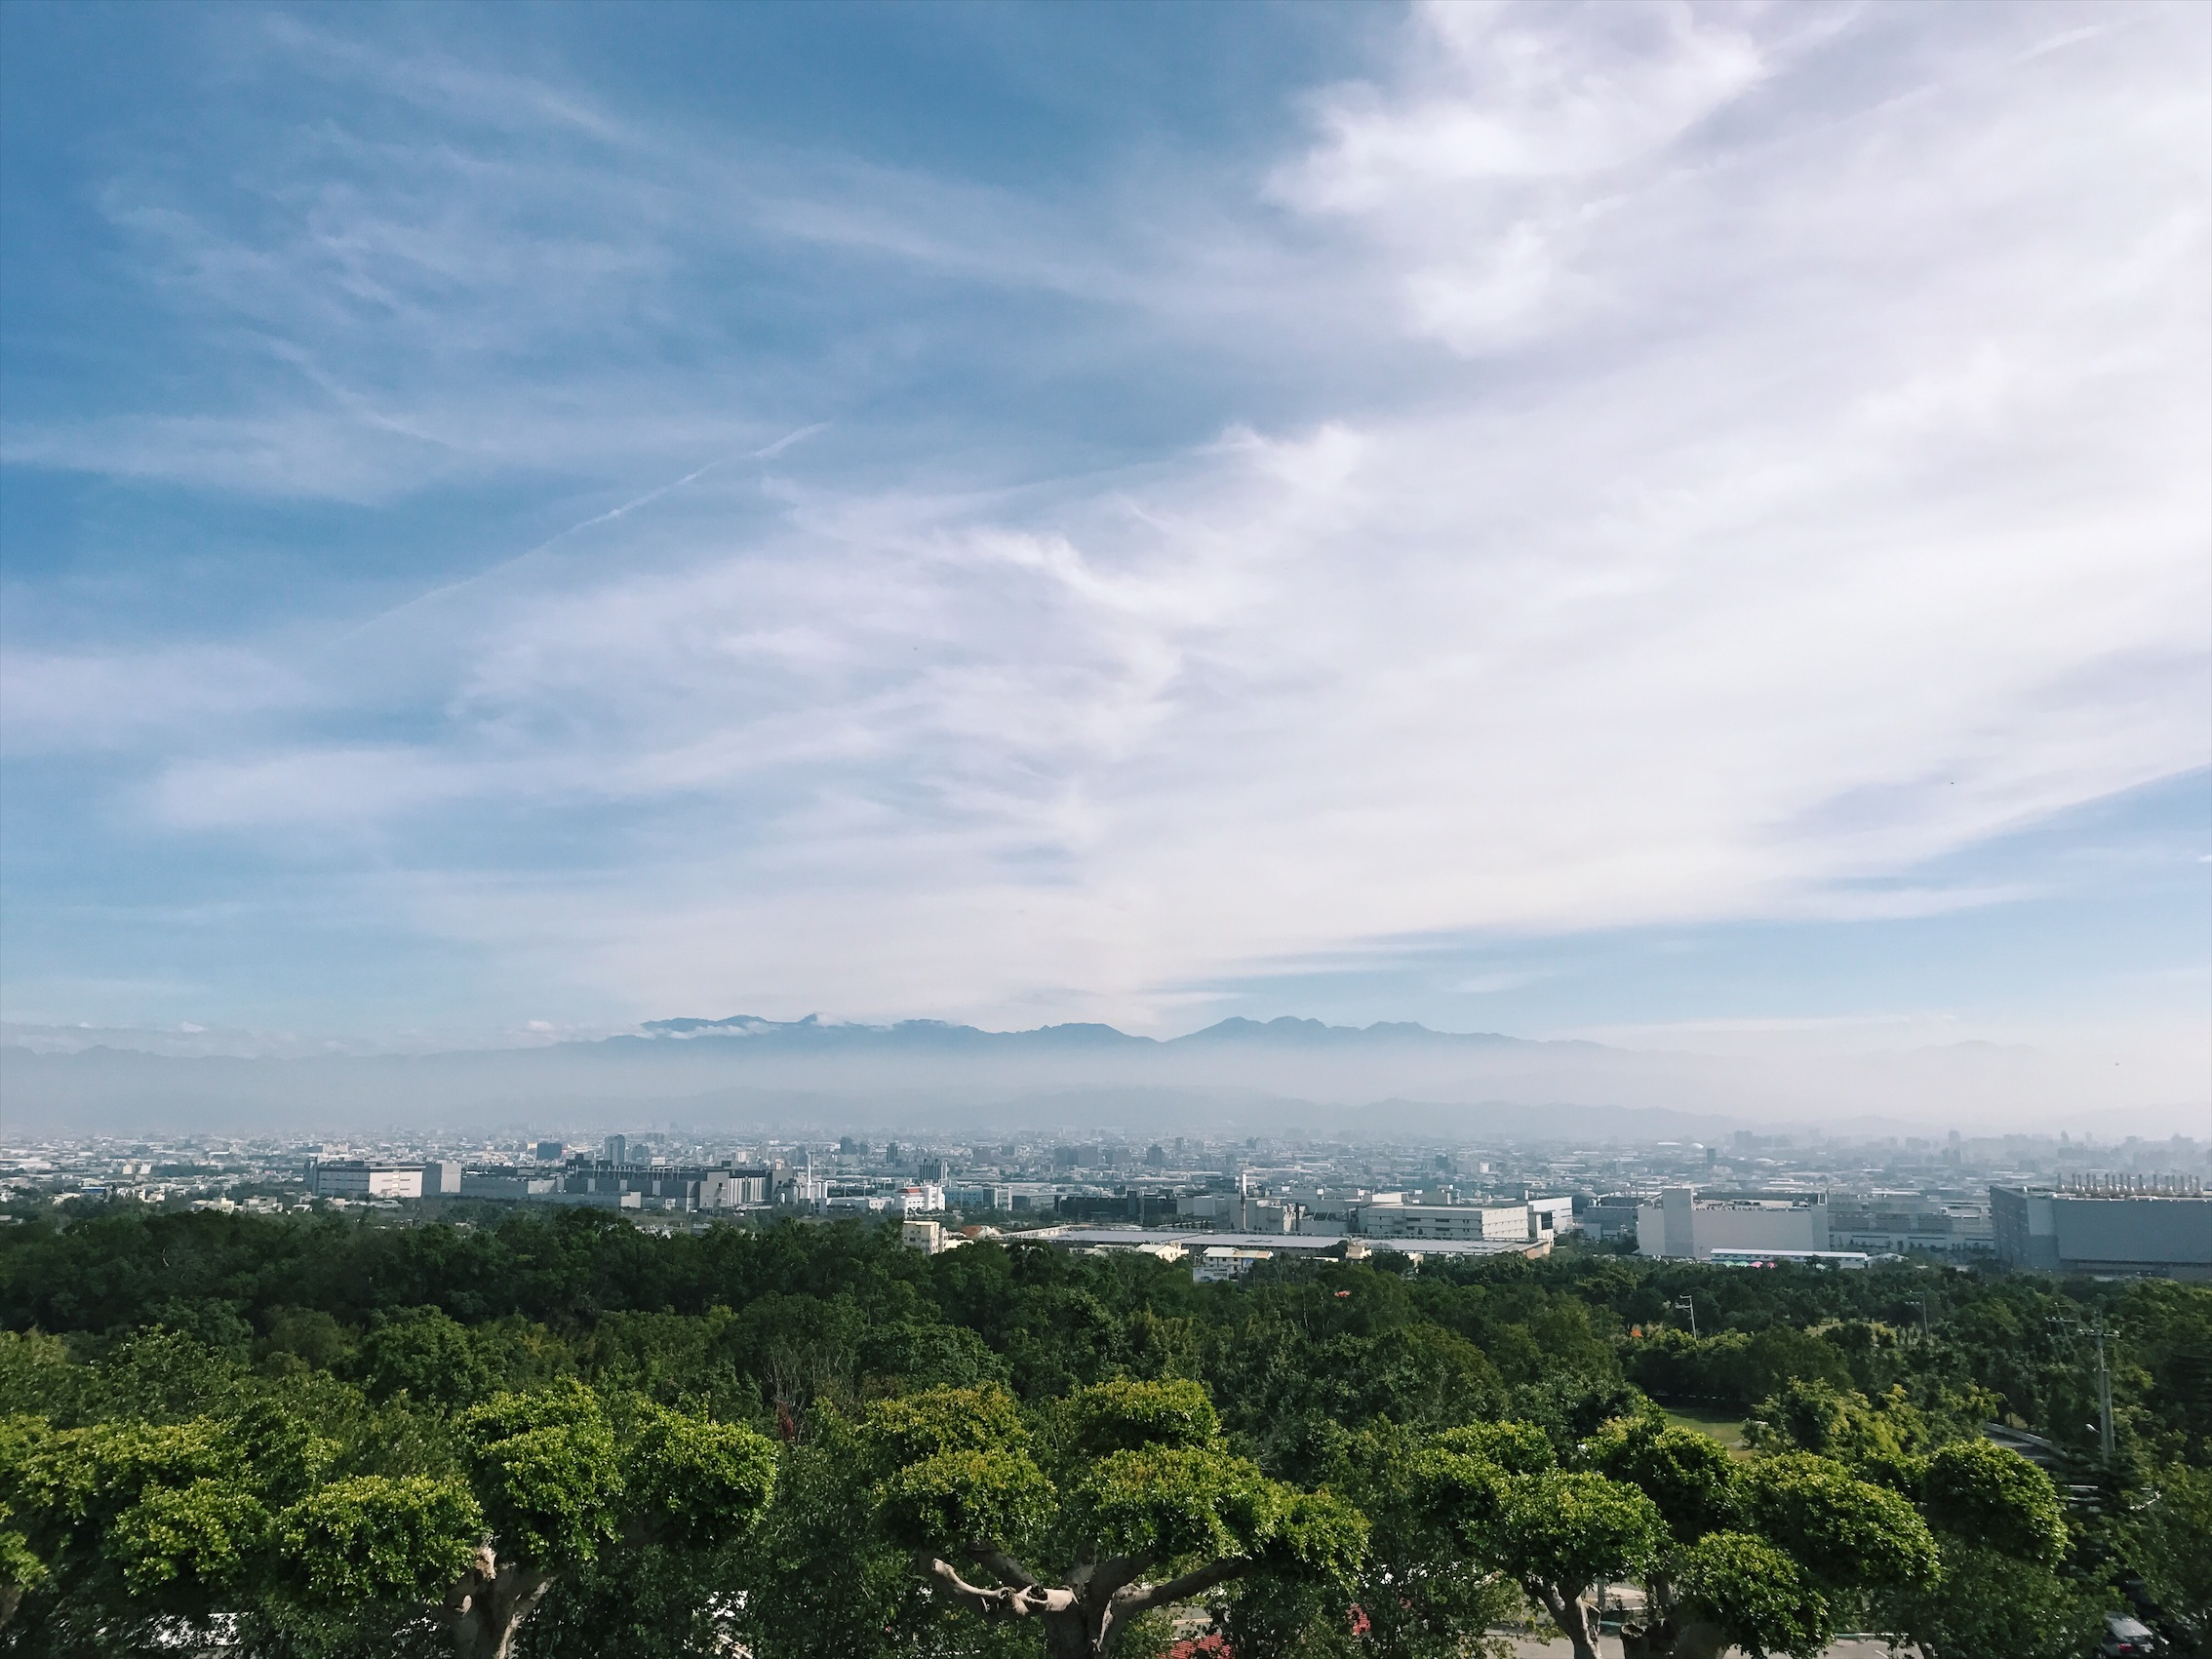 Hualien - Kenting - Taichung